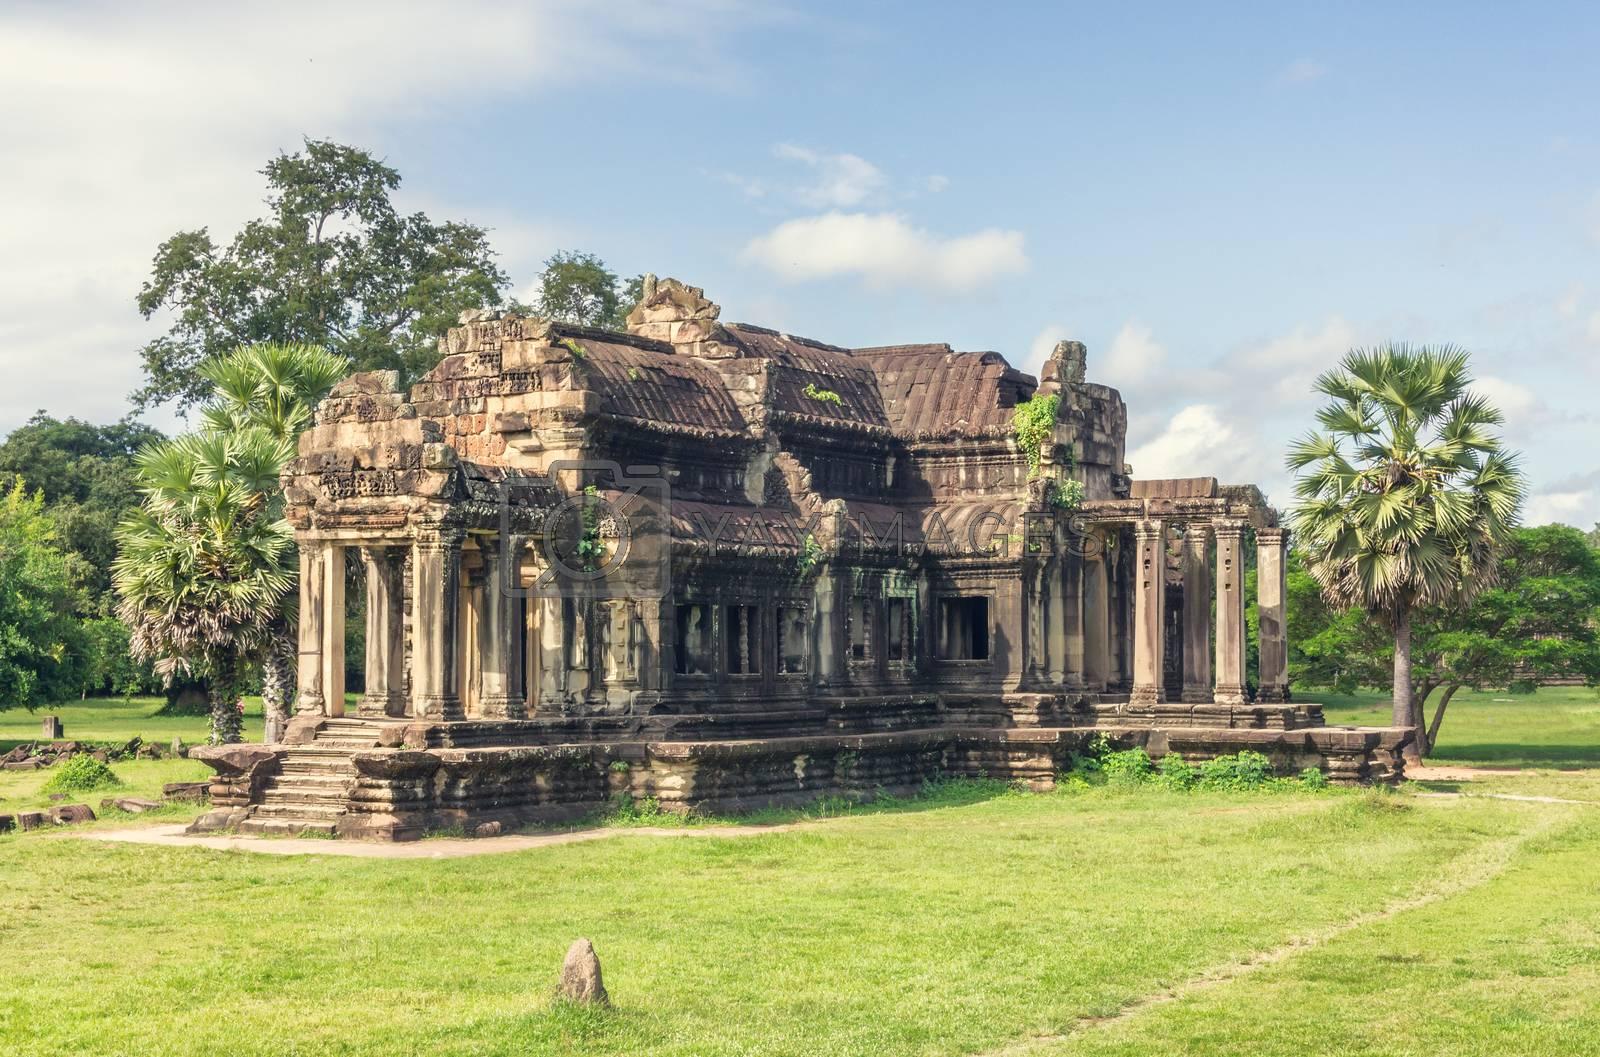 Angkor Wat in Cambodia. Ancient temple complex Angkor Wat